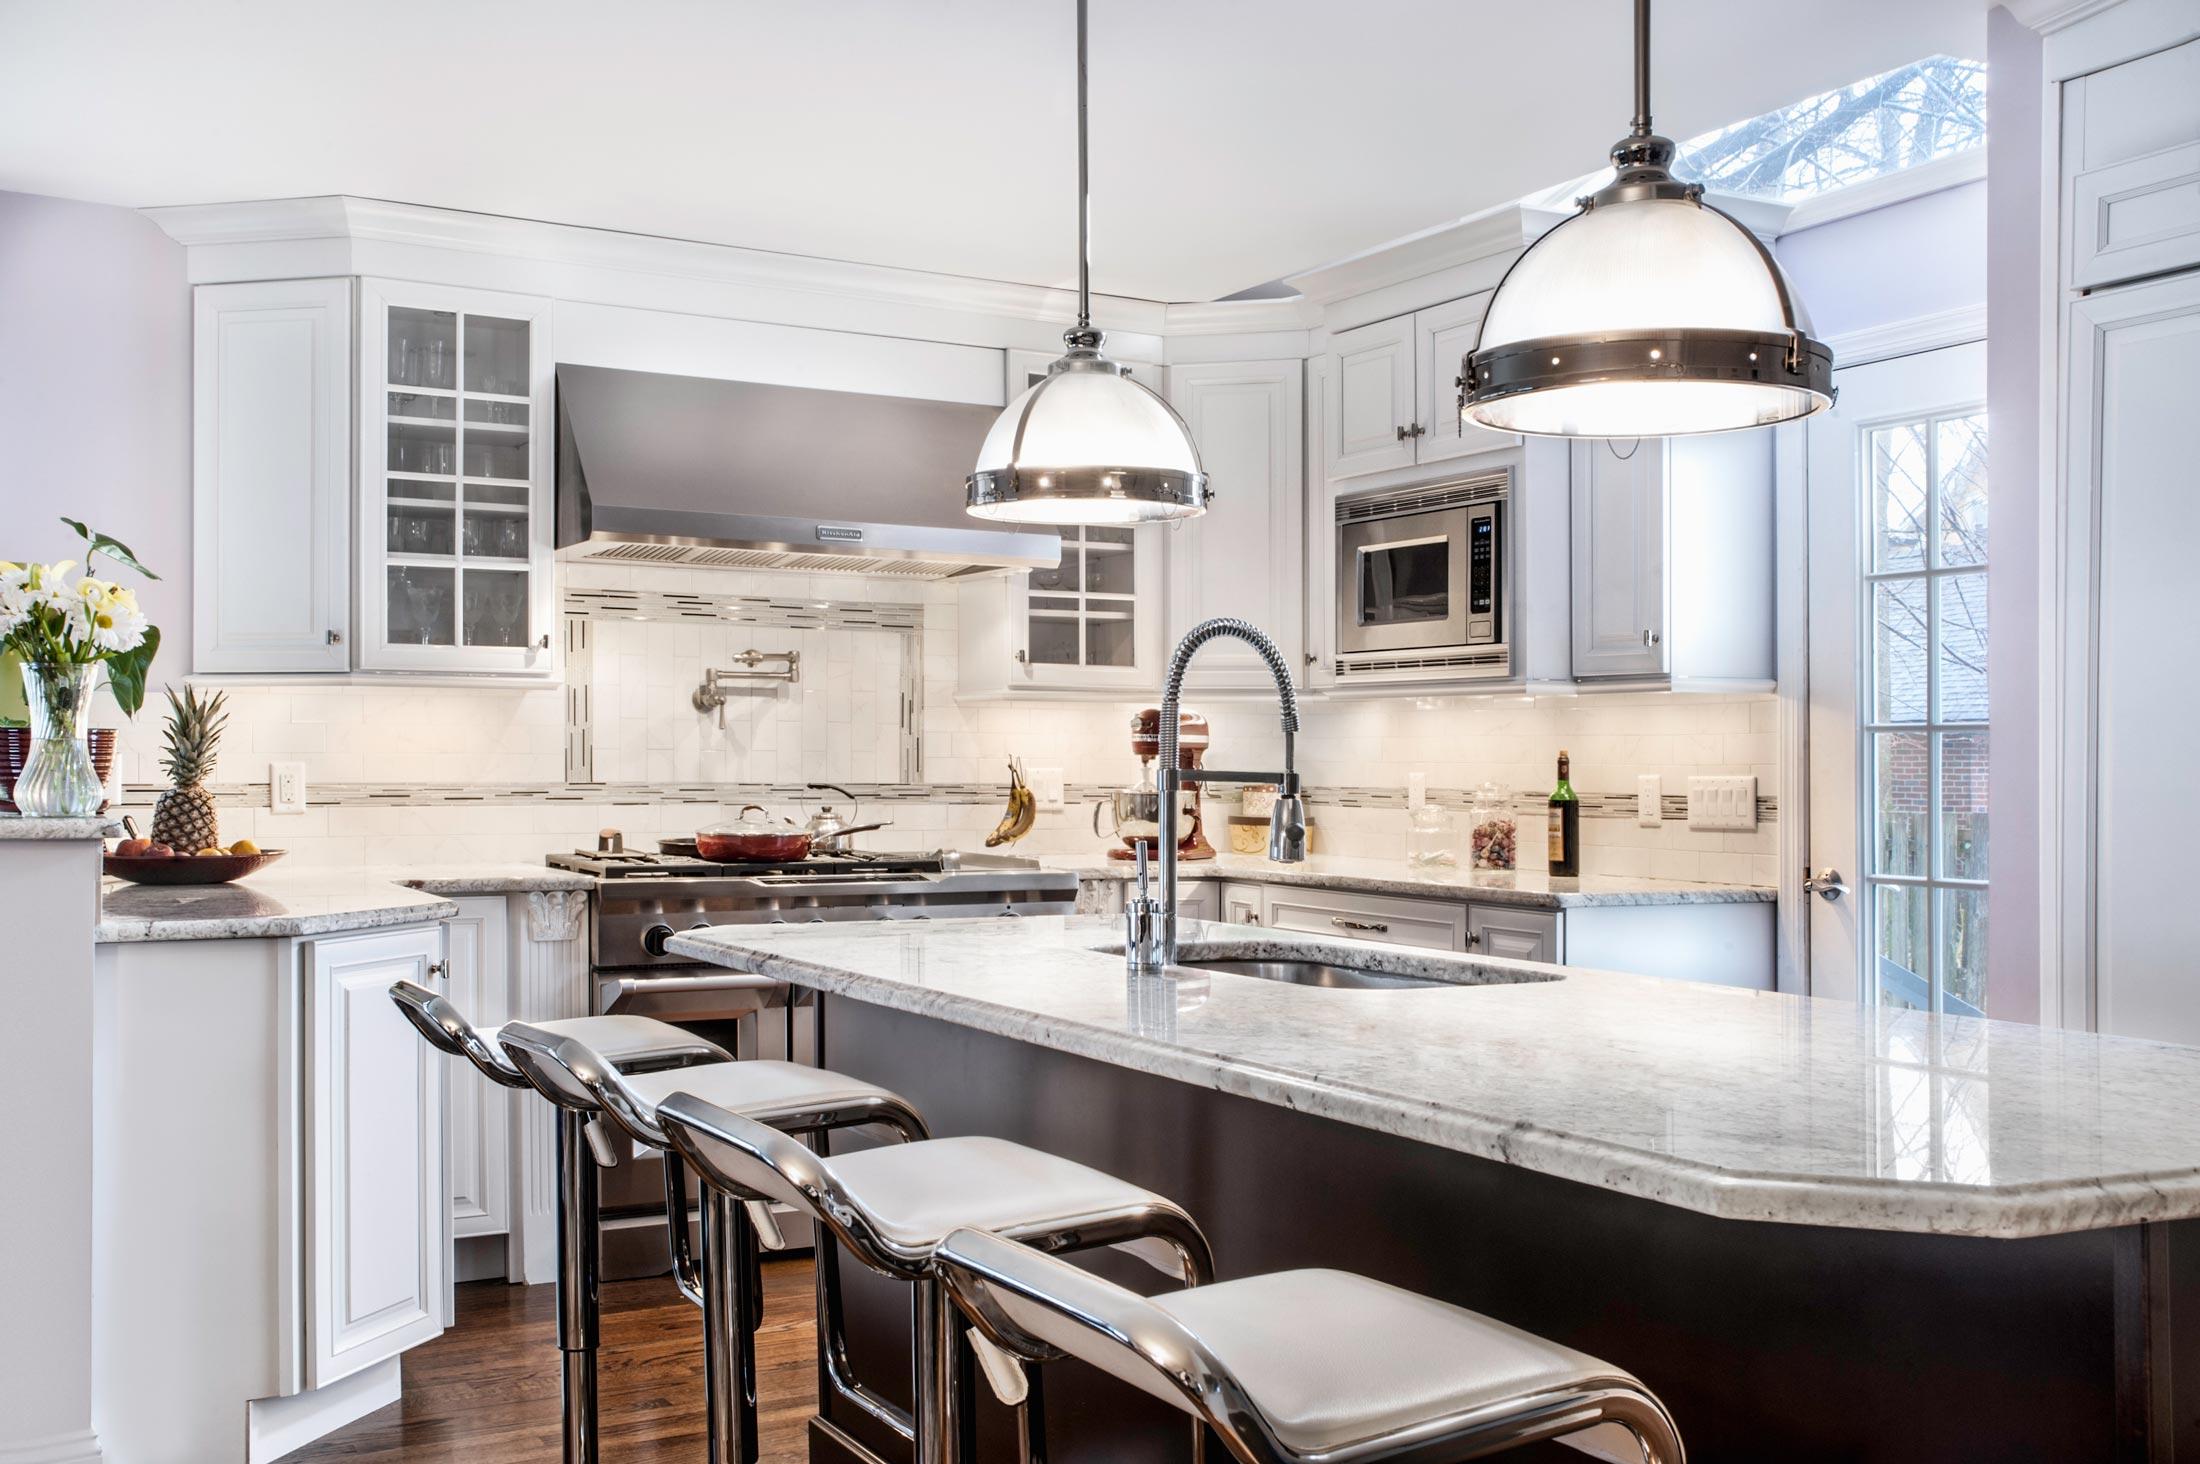 Beautiful kitchen with lighting fixtures